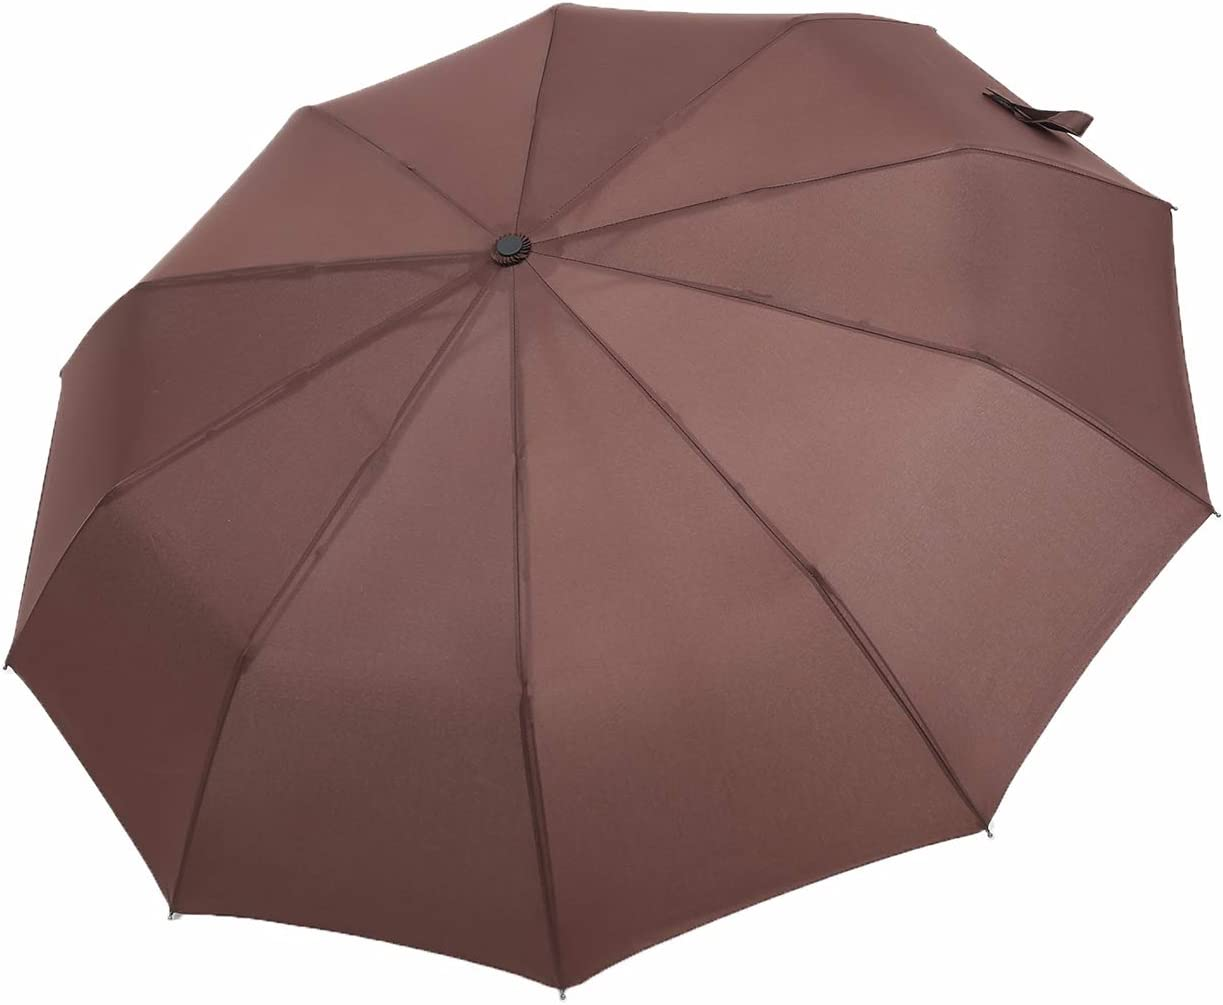 10 Ribs Fiberglass 46 Inch Travel Umbrella Fast Drying 210T Fabric Brown, Rubber Handle TenLeaf Automatic Folding Umbrellas Windproof